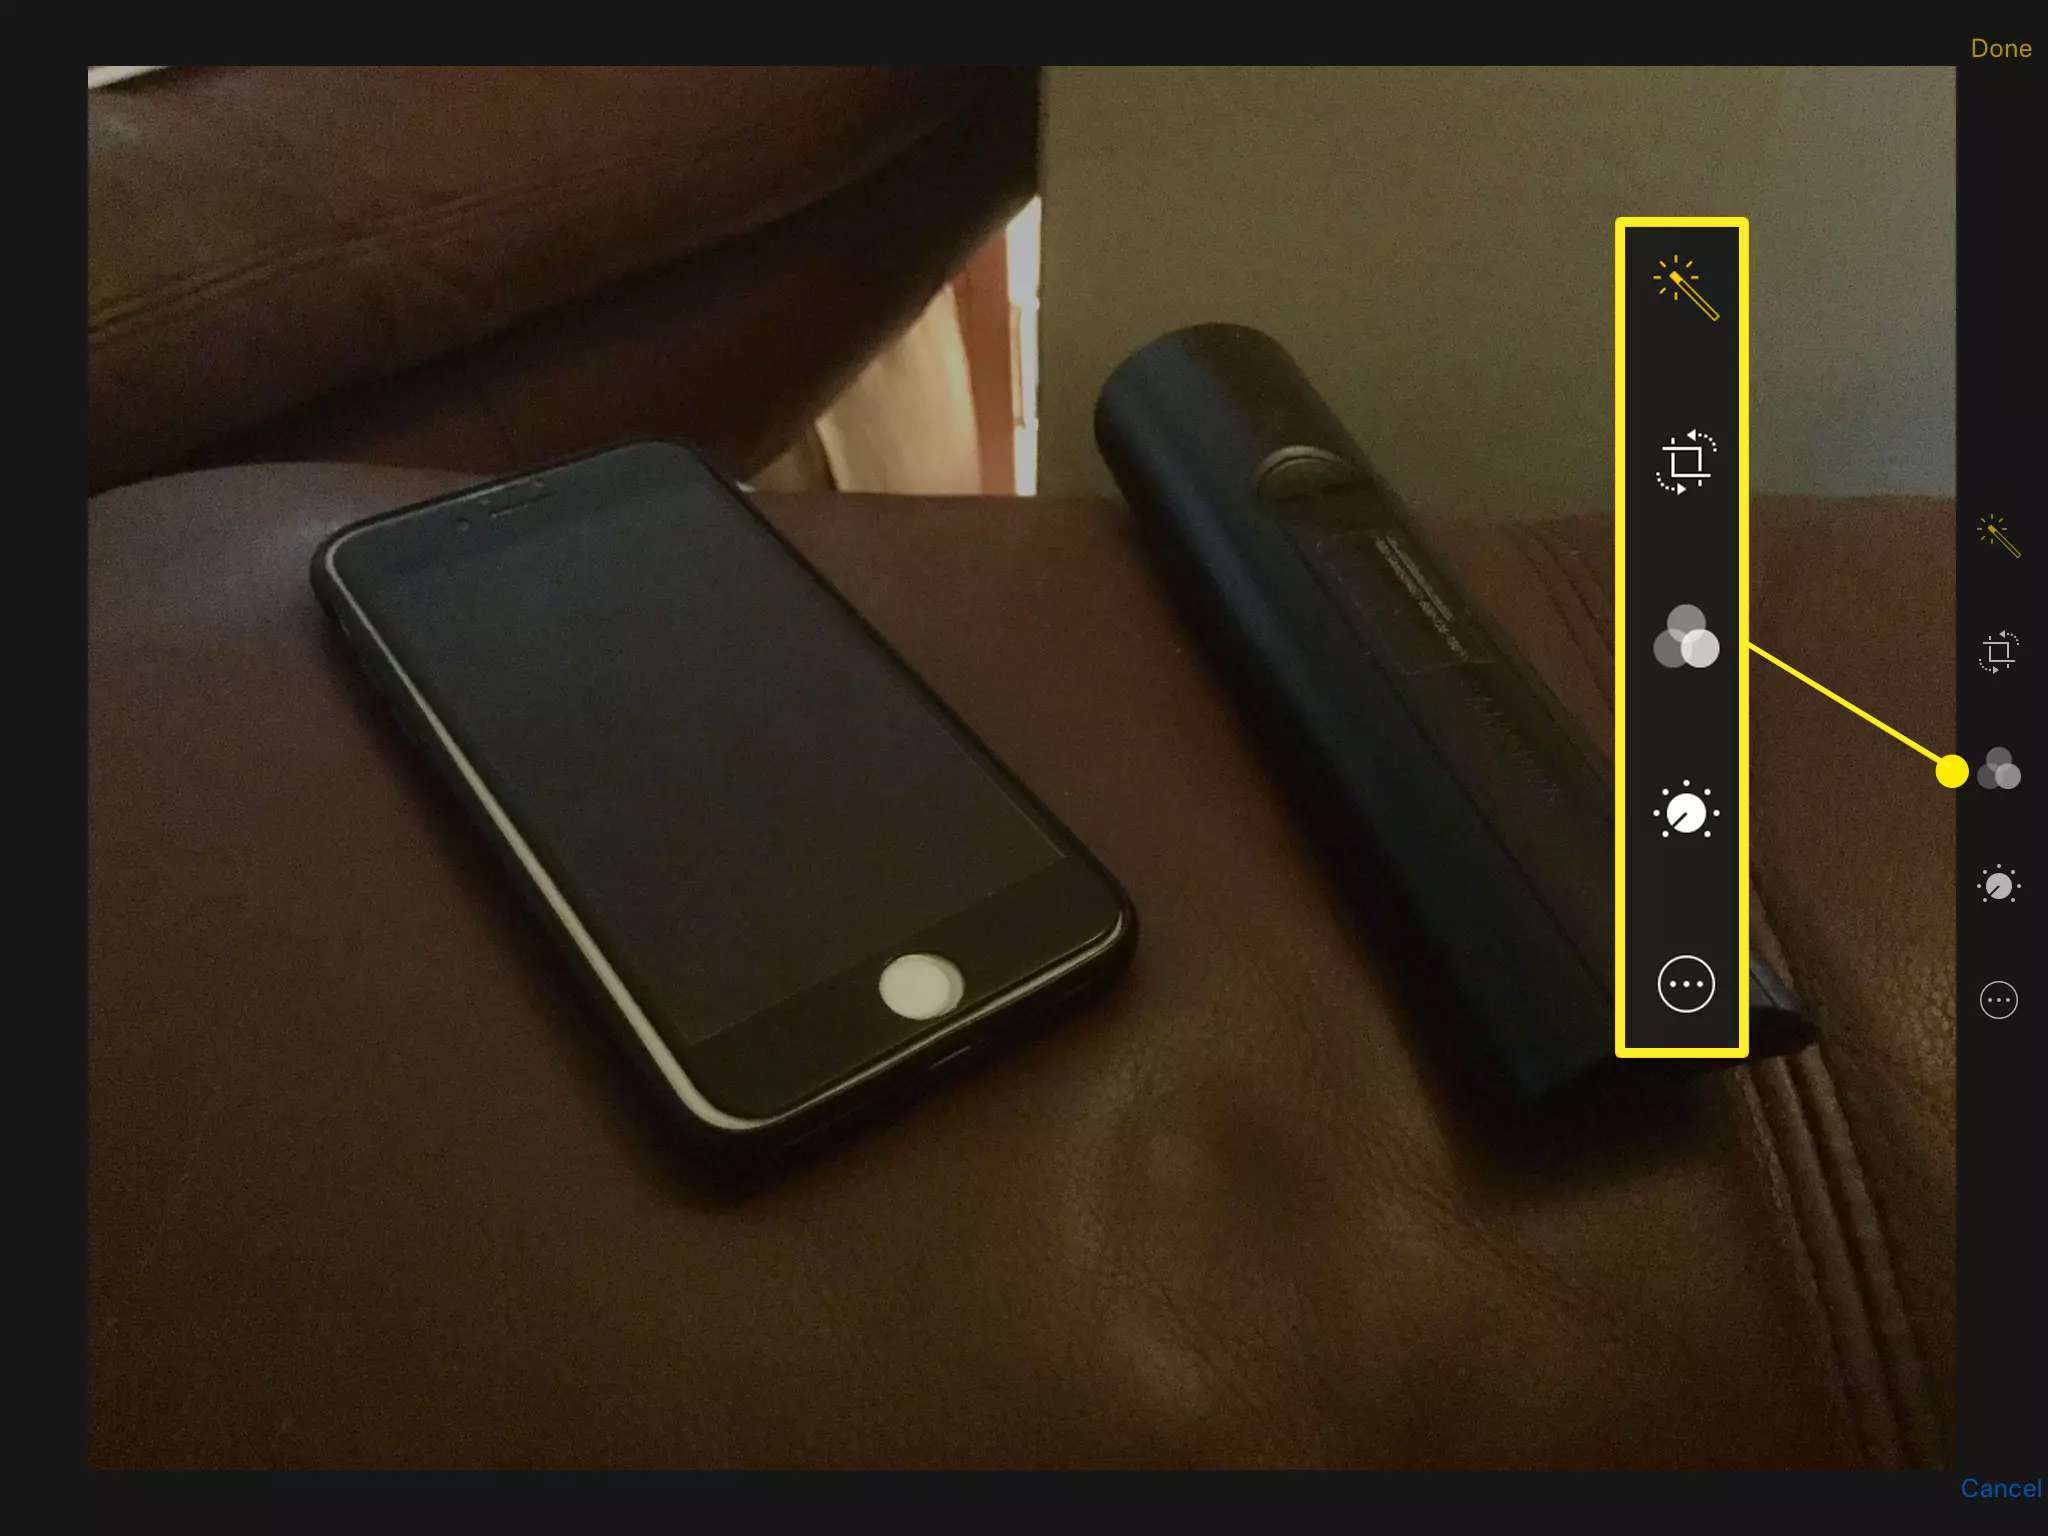 iPad Camera with editing controls highlighted